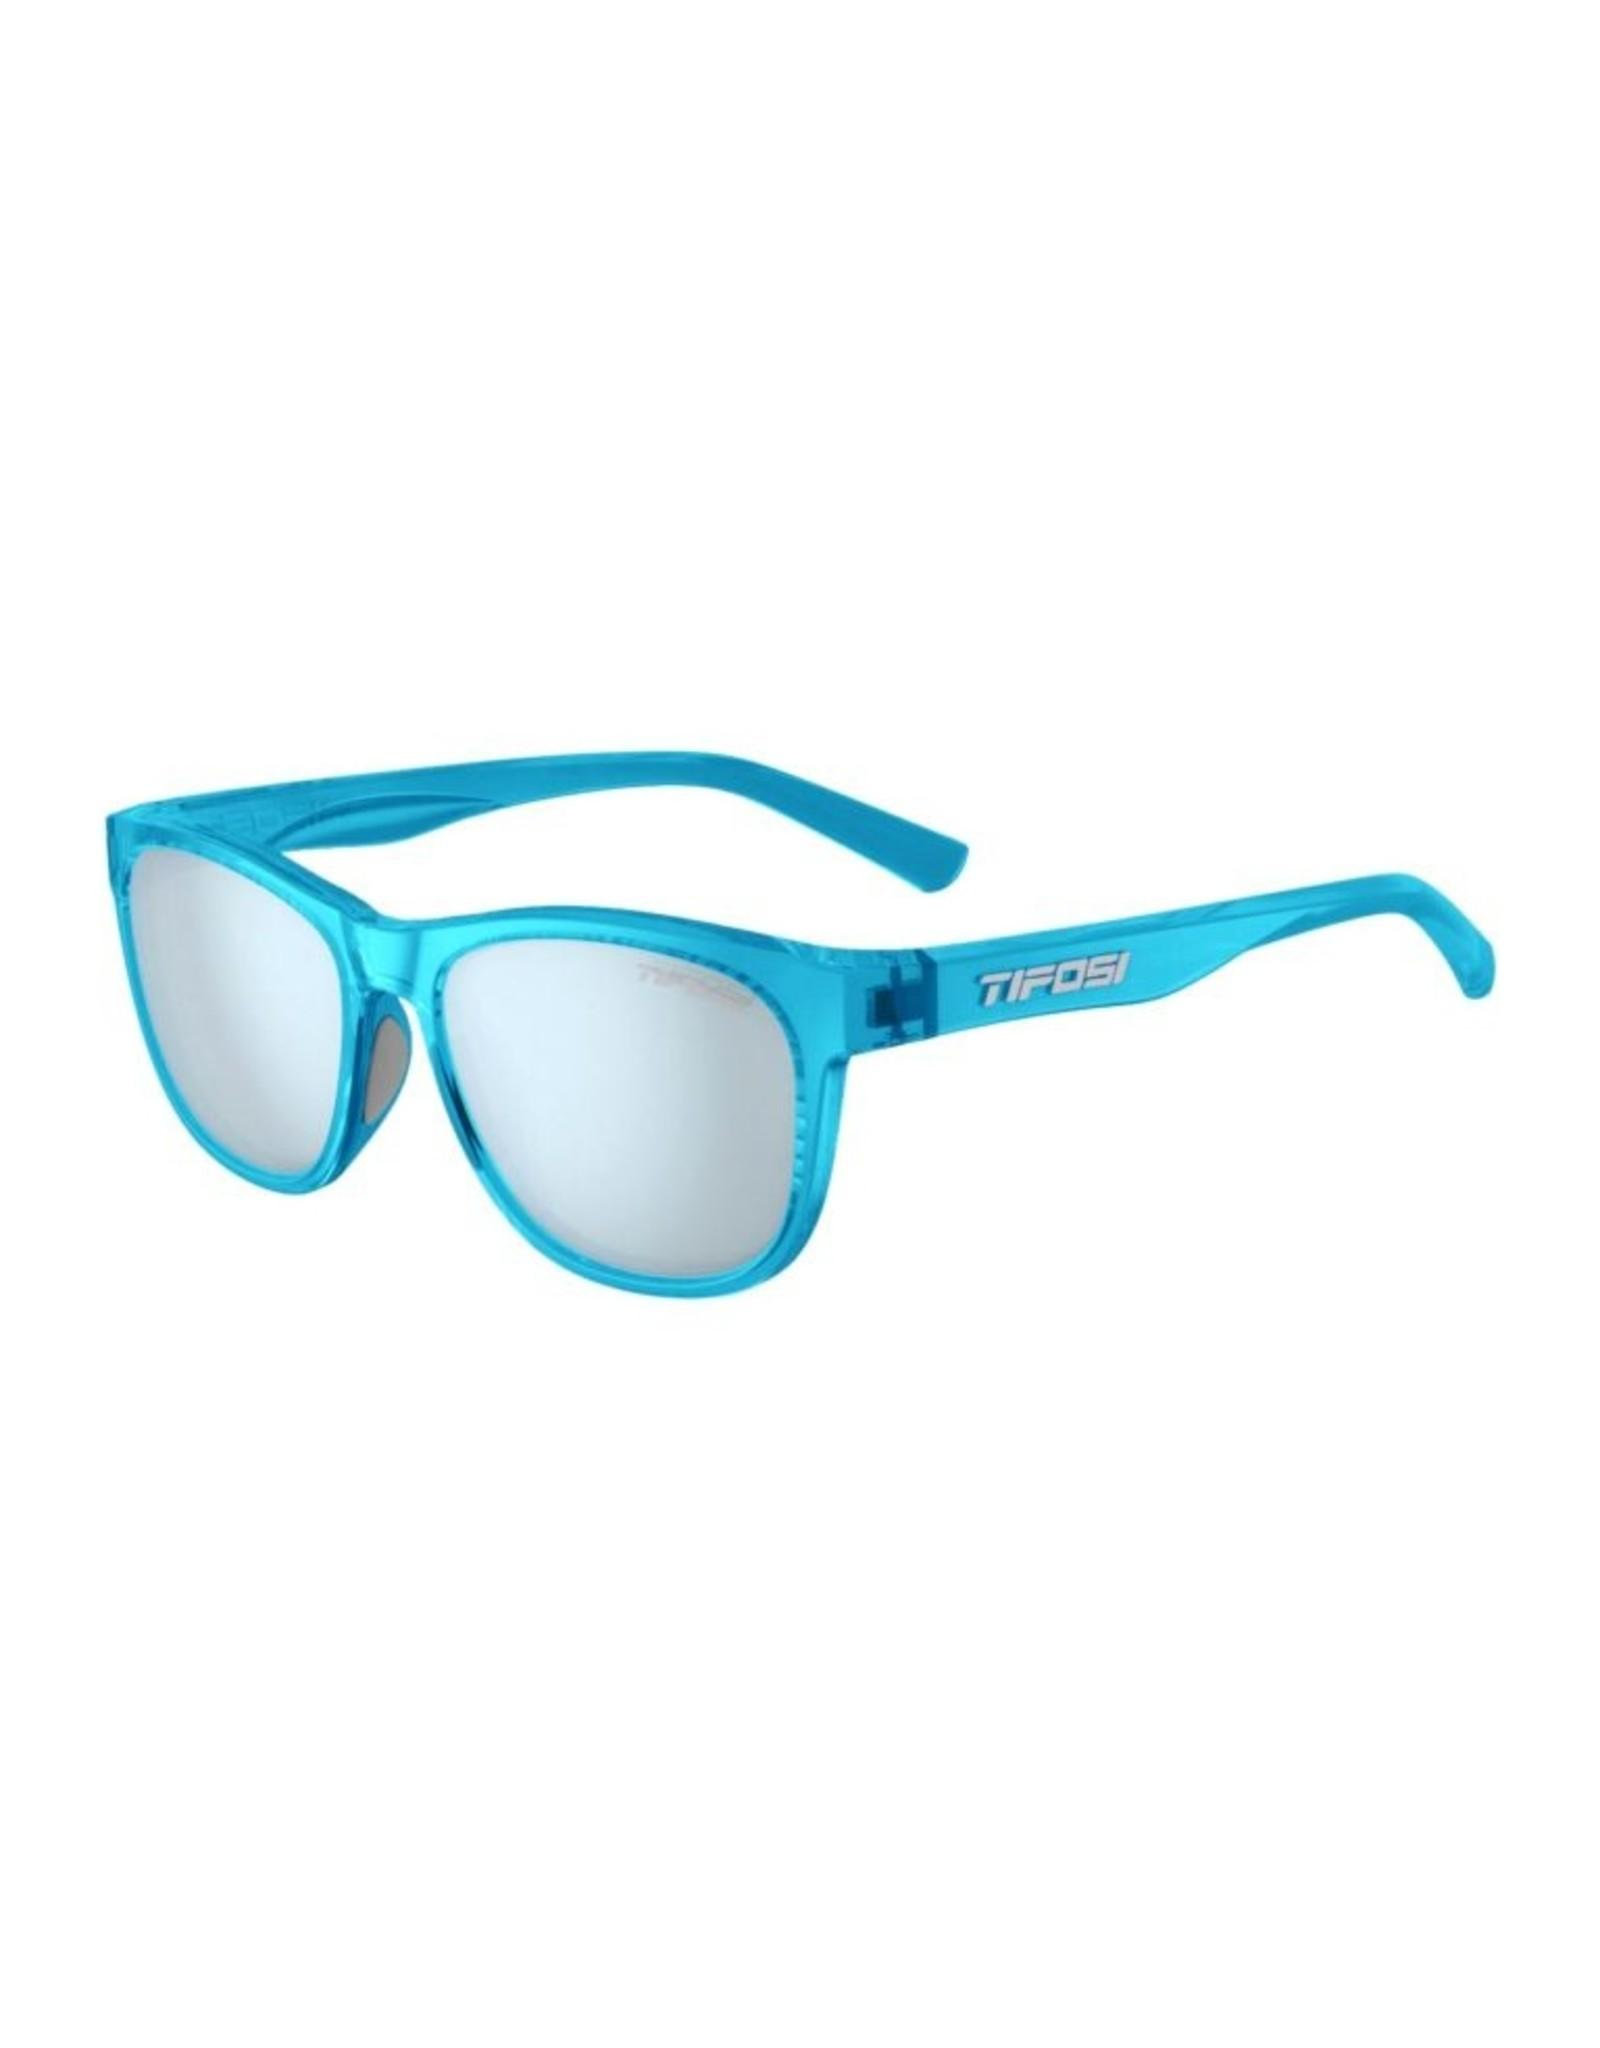 Tifosi Optics Swank, Crystal Sky Blue Single Lens Sunglasses - Smoke Bright Blue